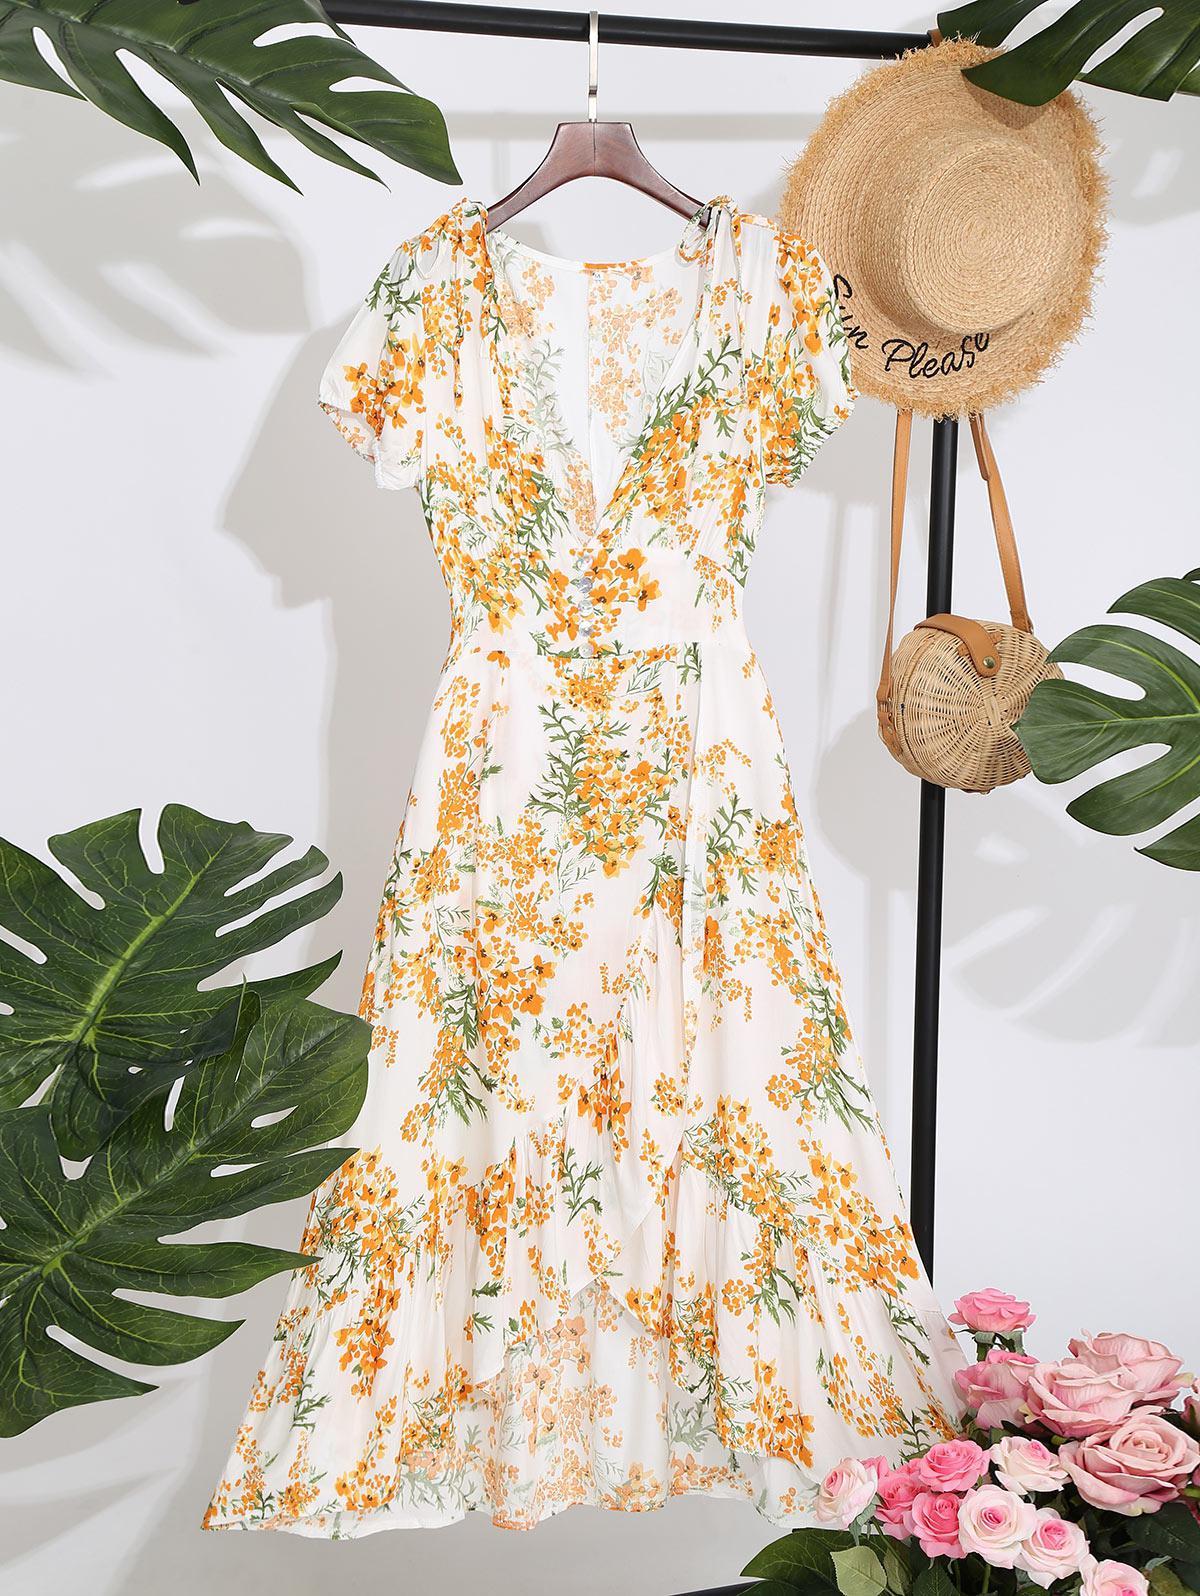 Floral Ruffles Overlap Midi Dress